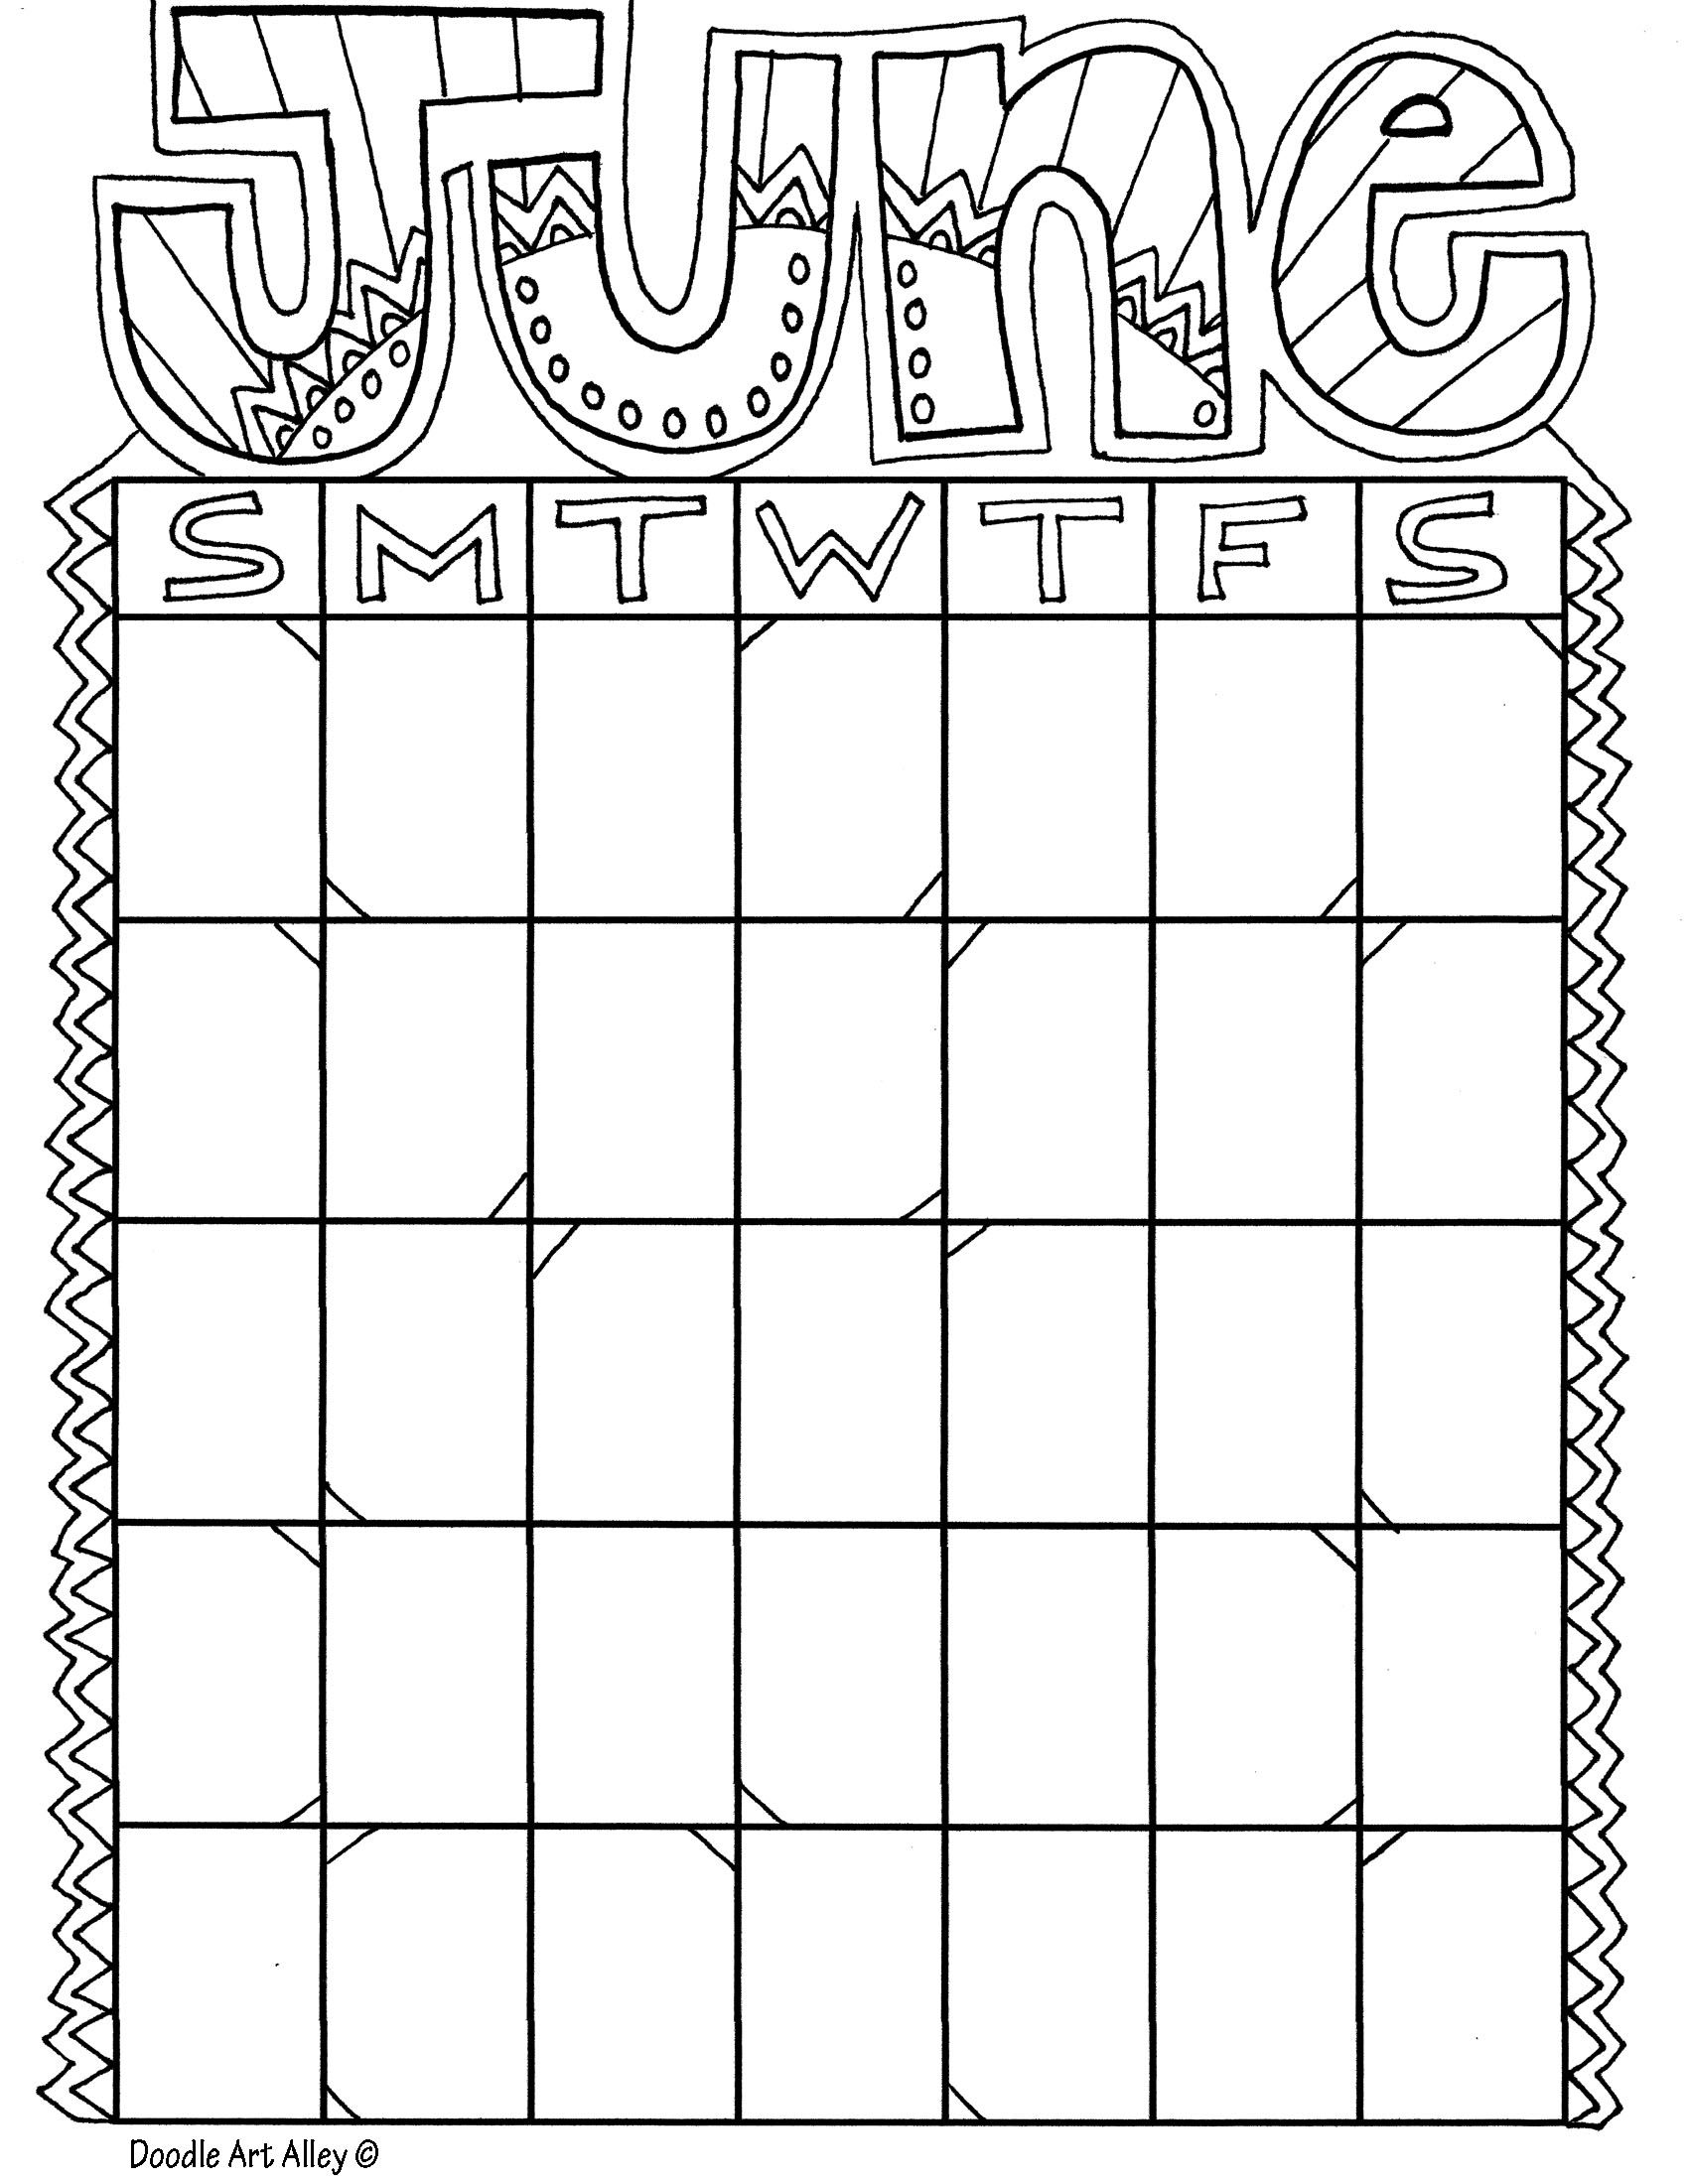 Calendars Coloring Pages Kids Calendar Coloring Calendar